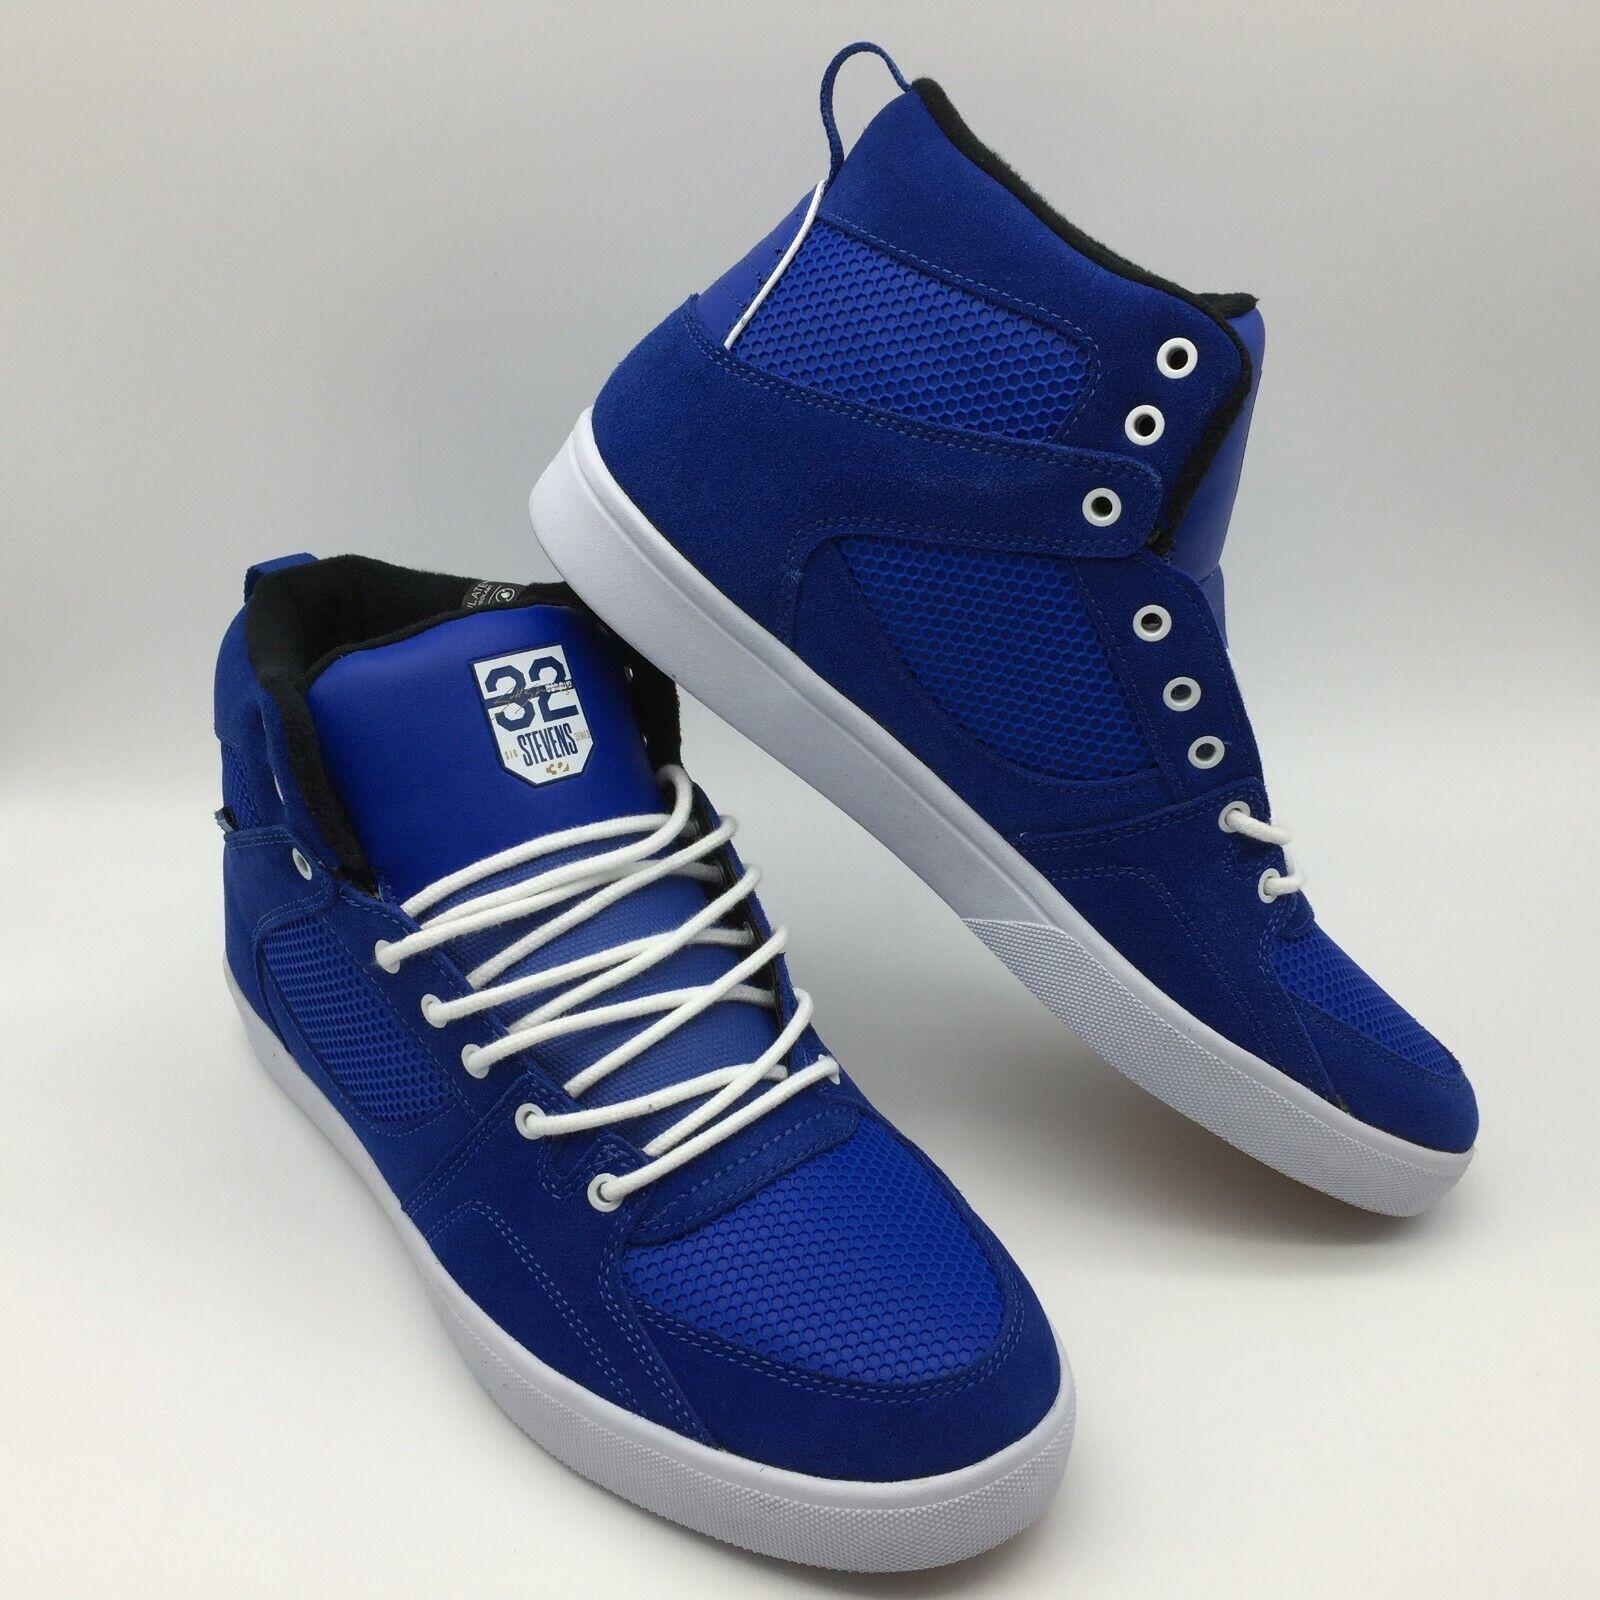 Etnies Hombre Zapatos Mujer  Harrison Htw X 32  Azul   blancoo   Gum